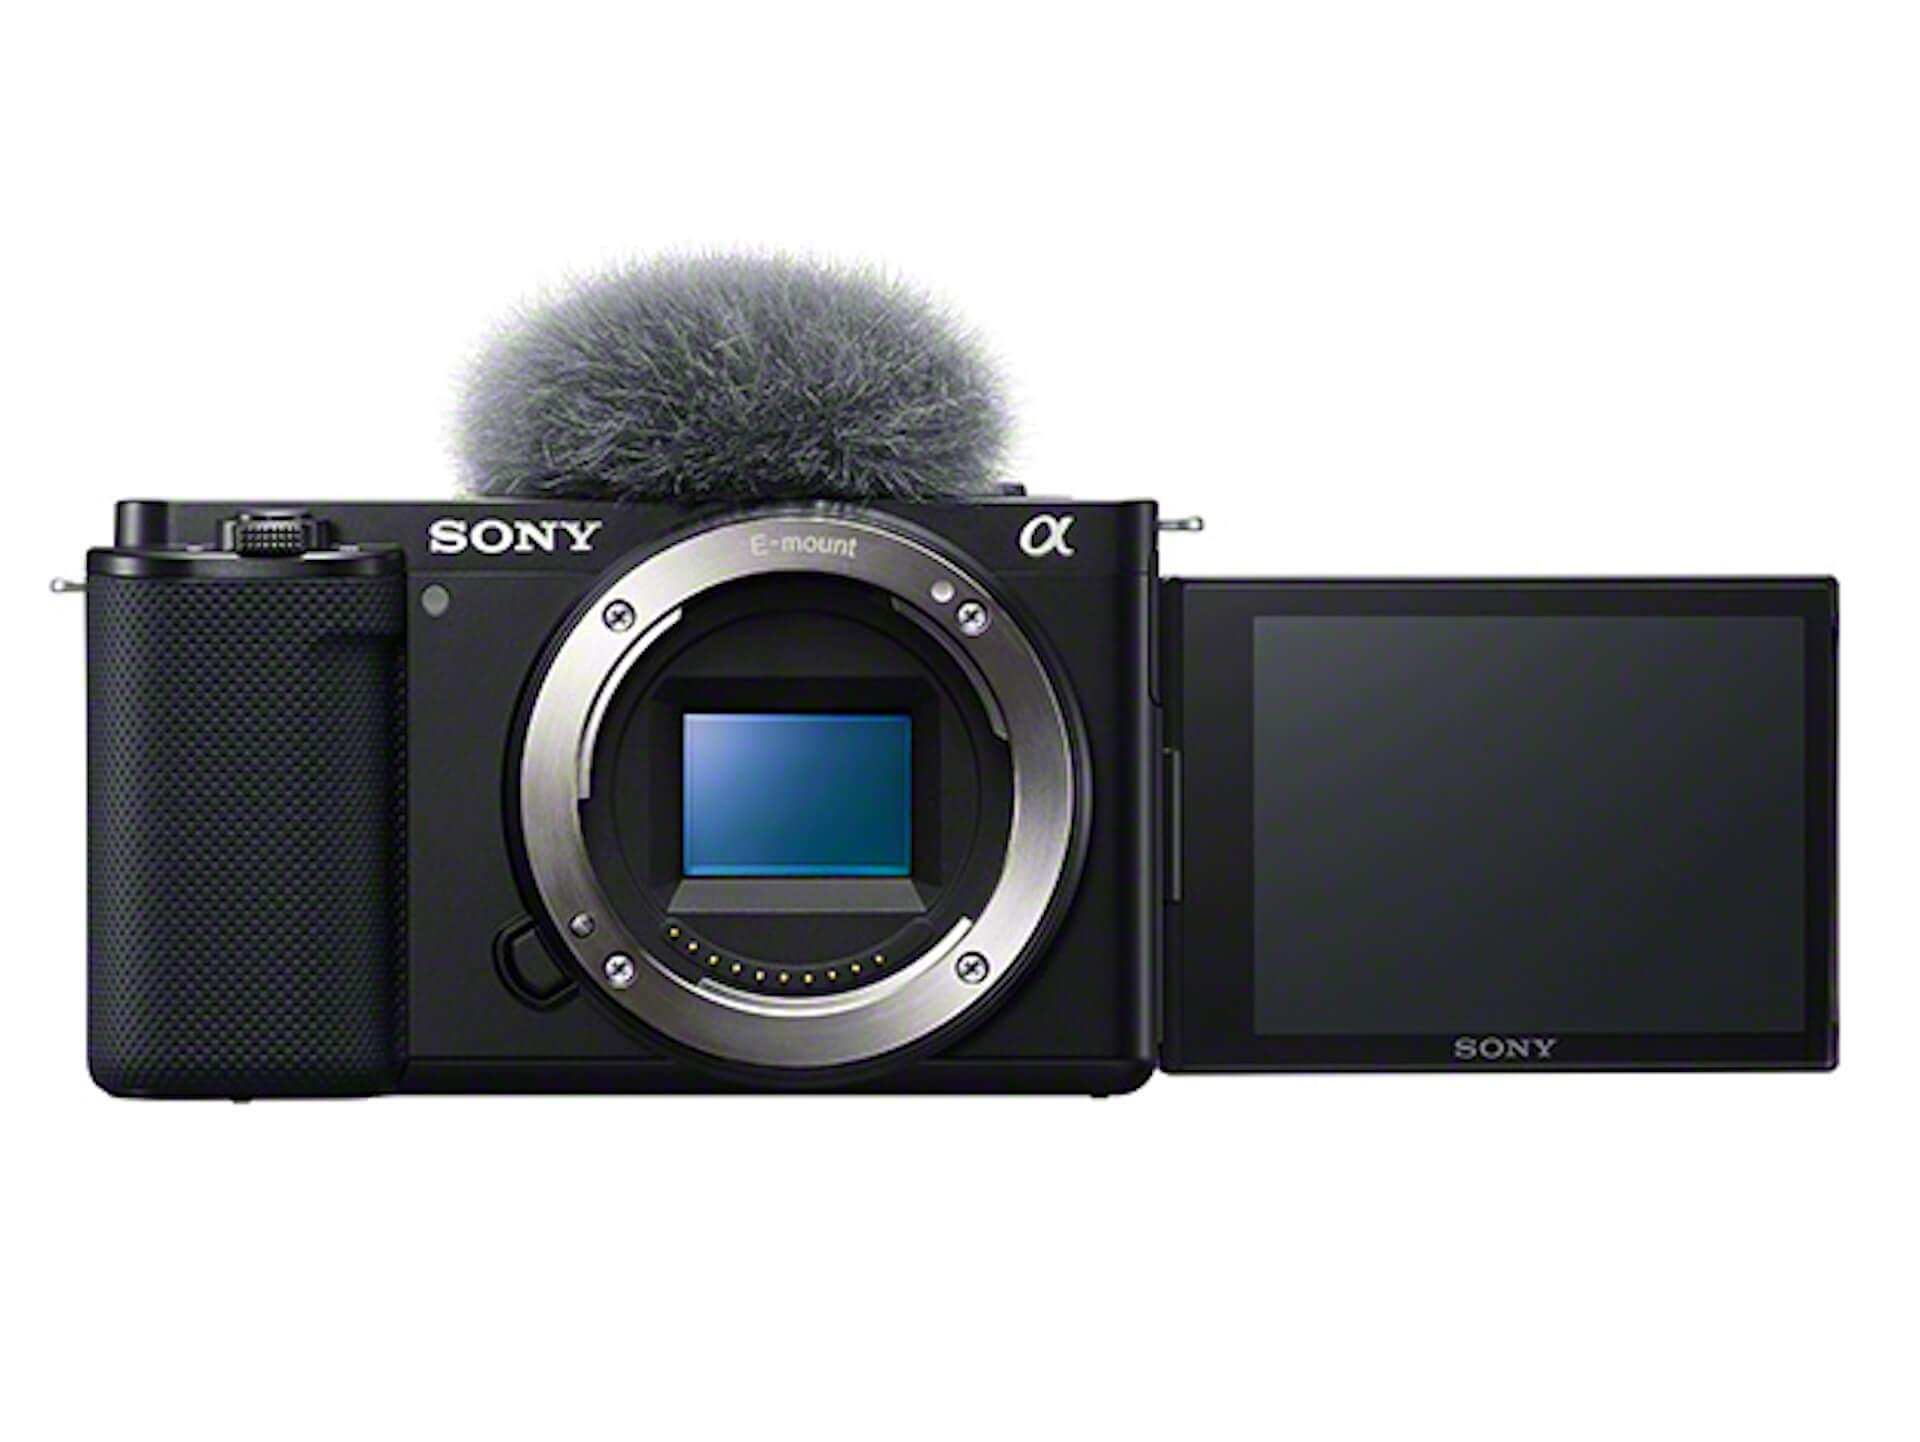 SONYからVlog撮影に特化したαTMシリーズ初のレンズ交換式カメラ「VLOGCAMTM ZV-E10」が発売! tech_210729_sonyvlogcam2